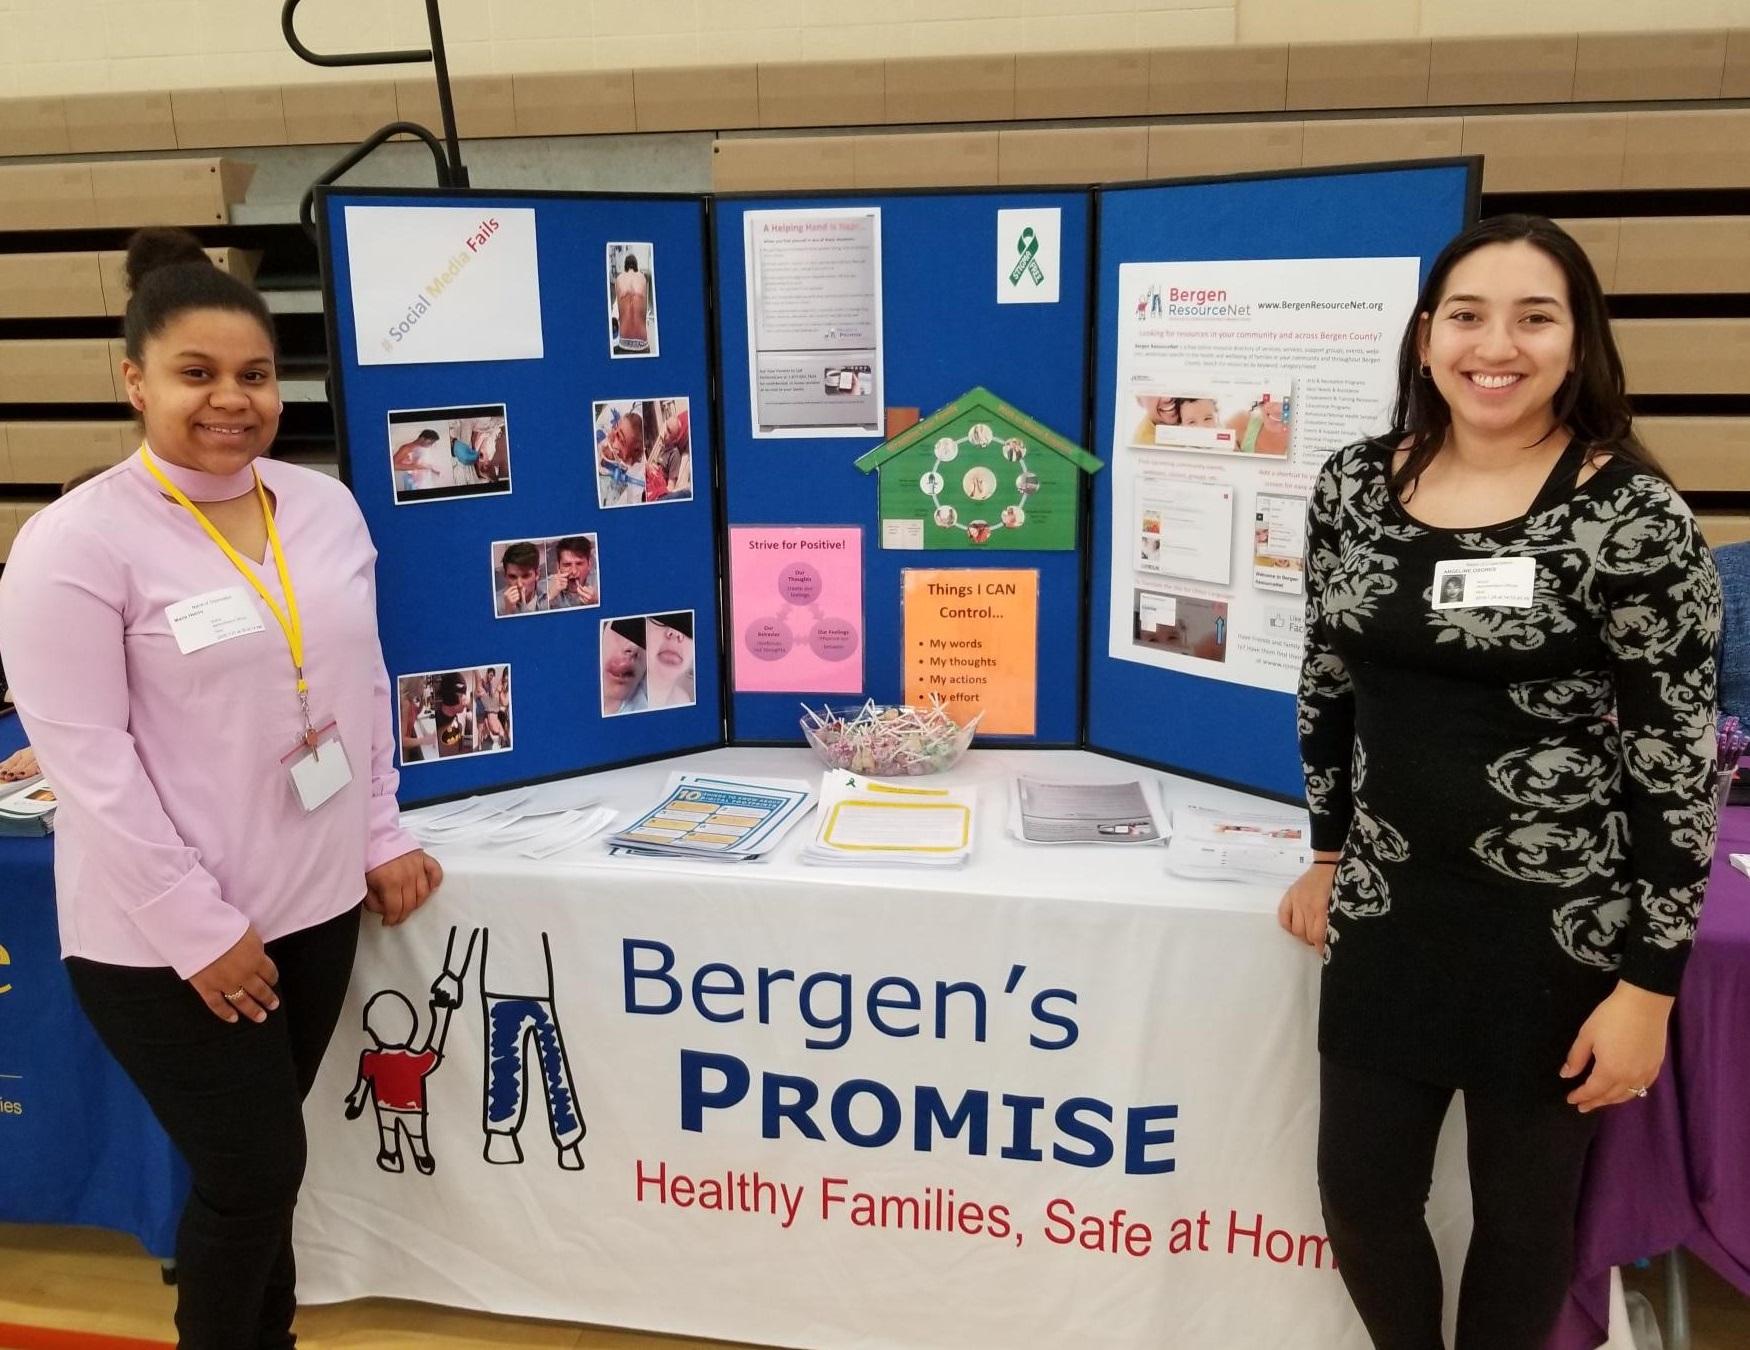 Bergen's Promise at Dumont High School